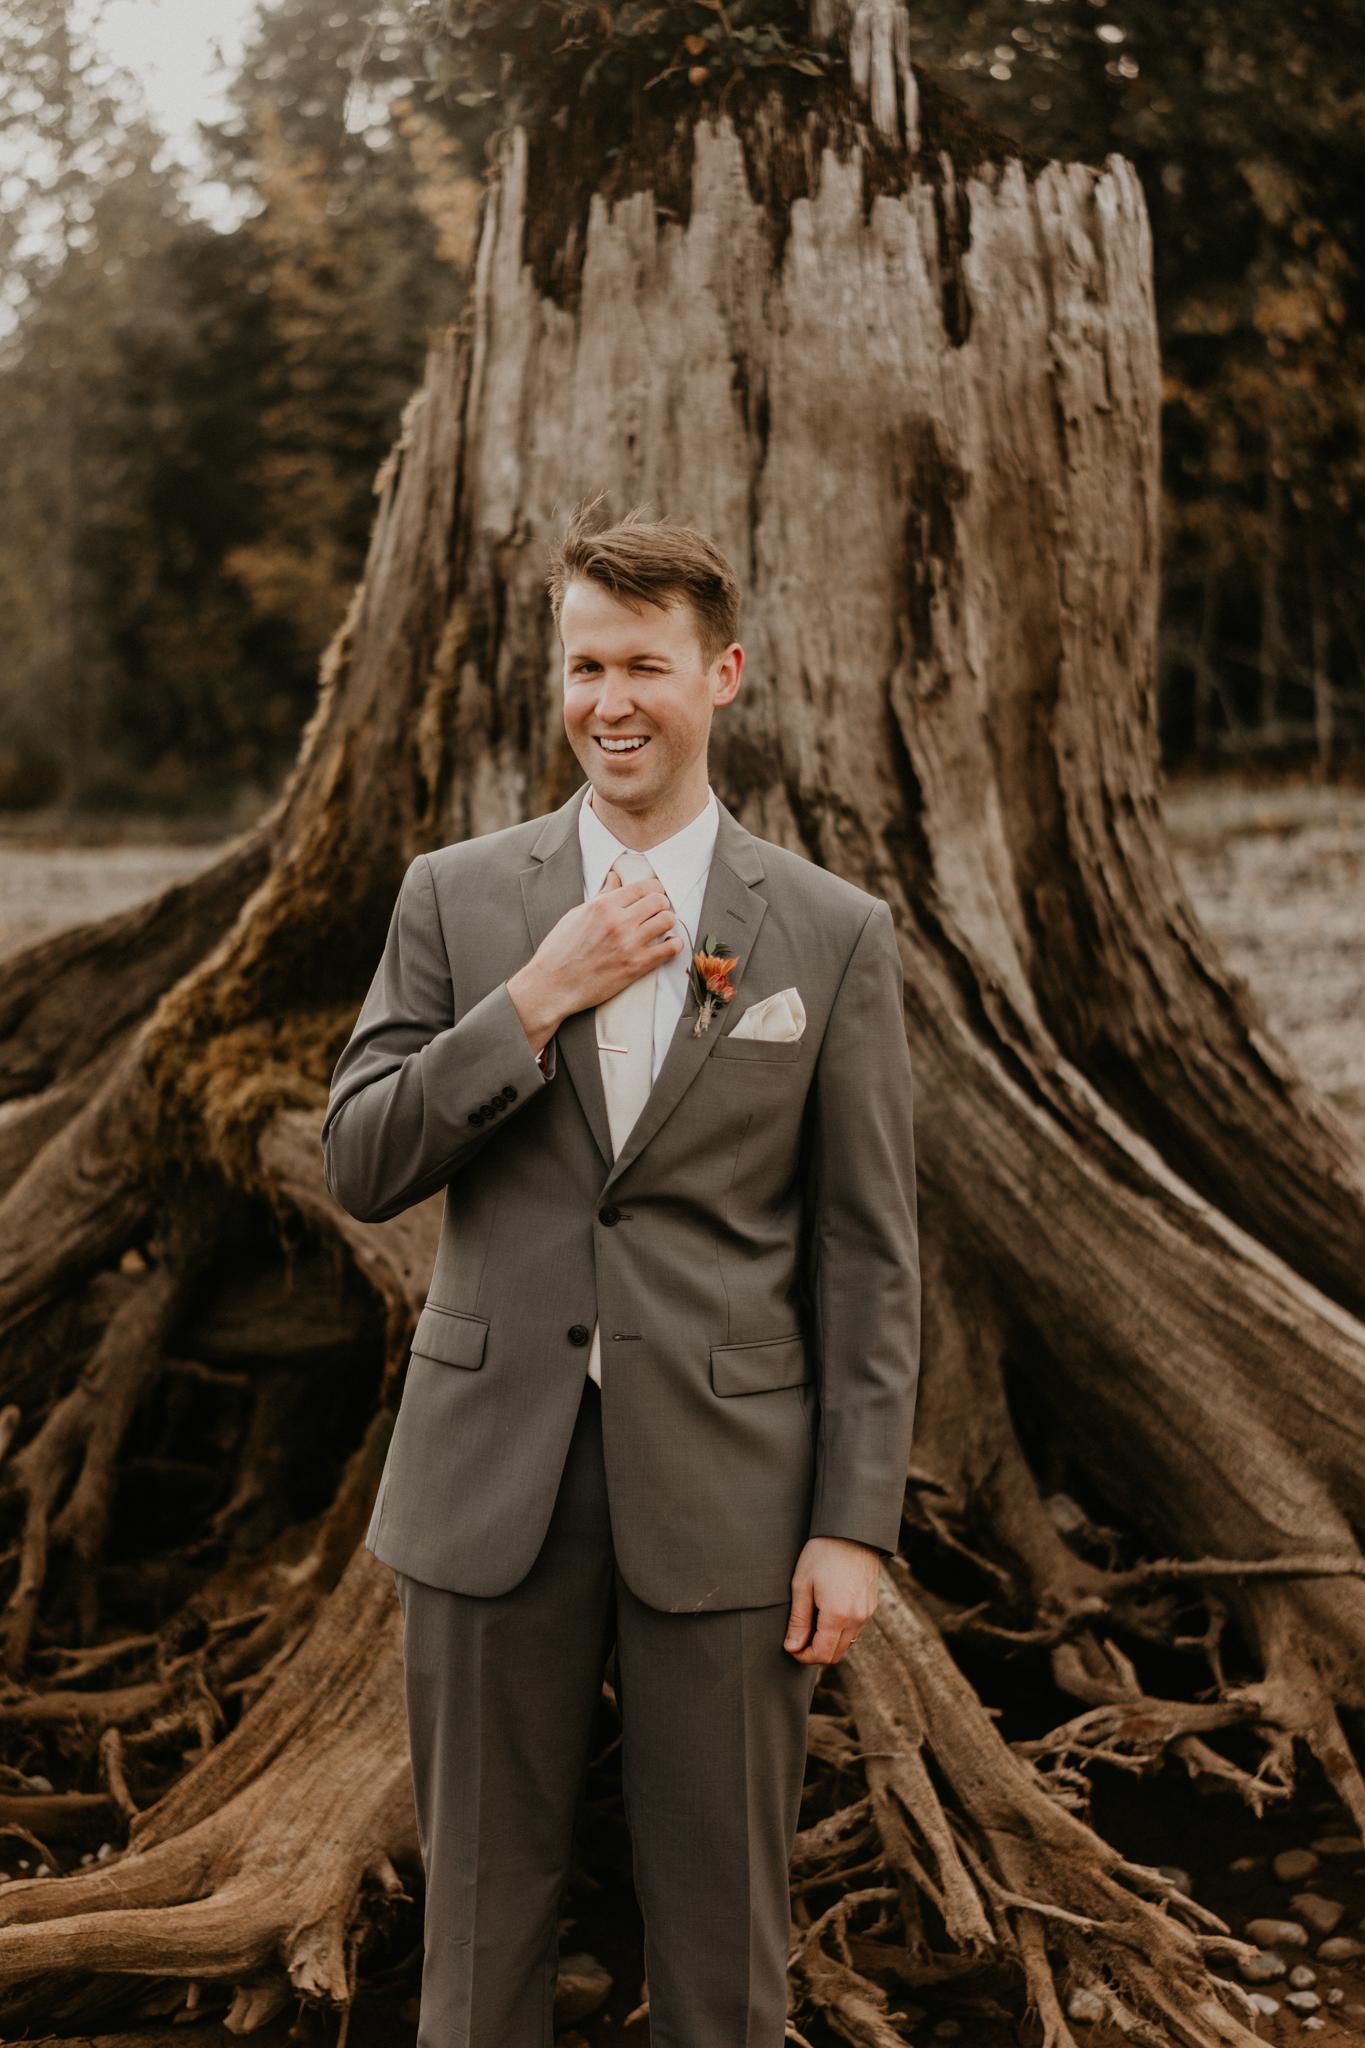 Lake-Cushman-Wedding-Elopement-Engagement-Seattle-Washington-PNW-Adventure-Nature-Photographer-21.jpg